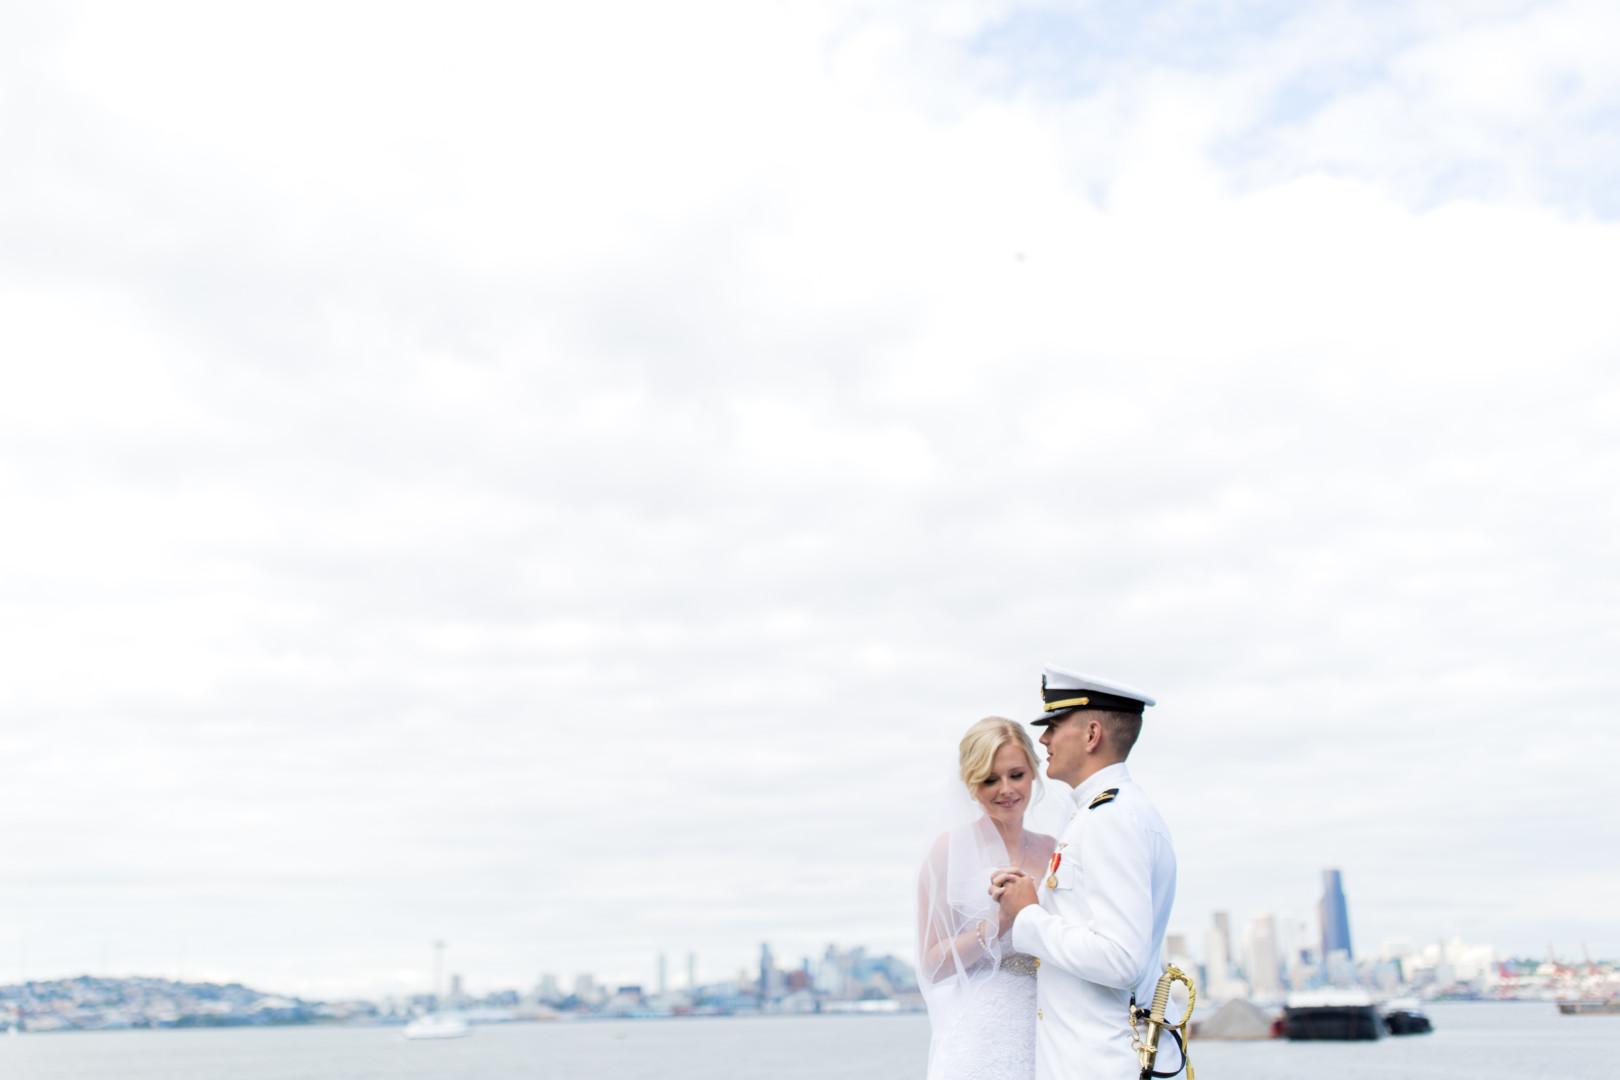 16-5-Looch-Lauren-Worl-Seattle-Wedding-Photography-Nicole-Barkis-Photographer-First-Look-84